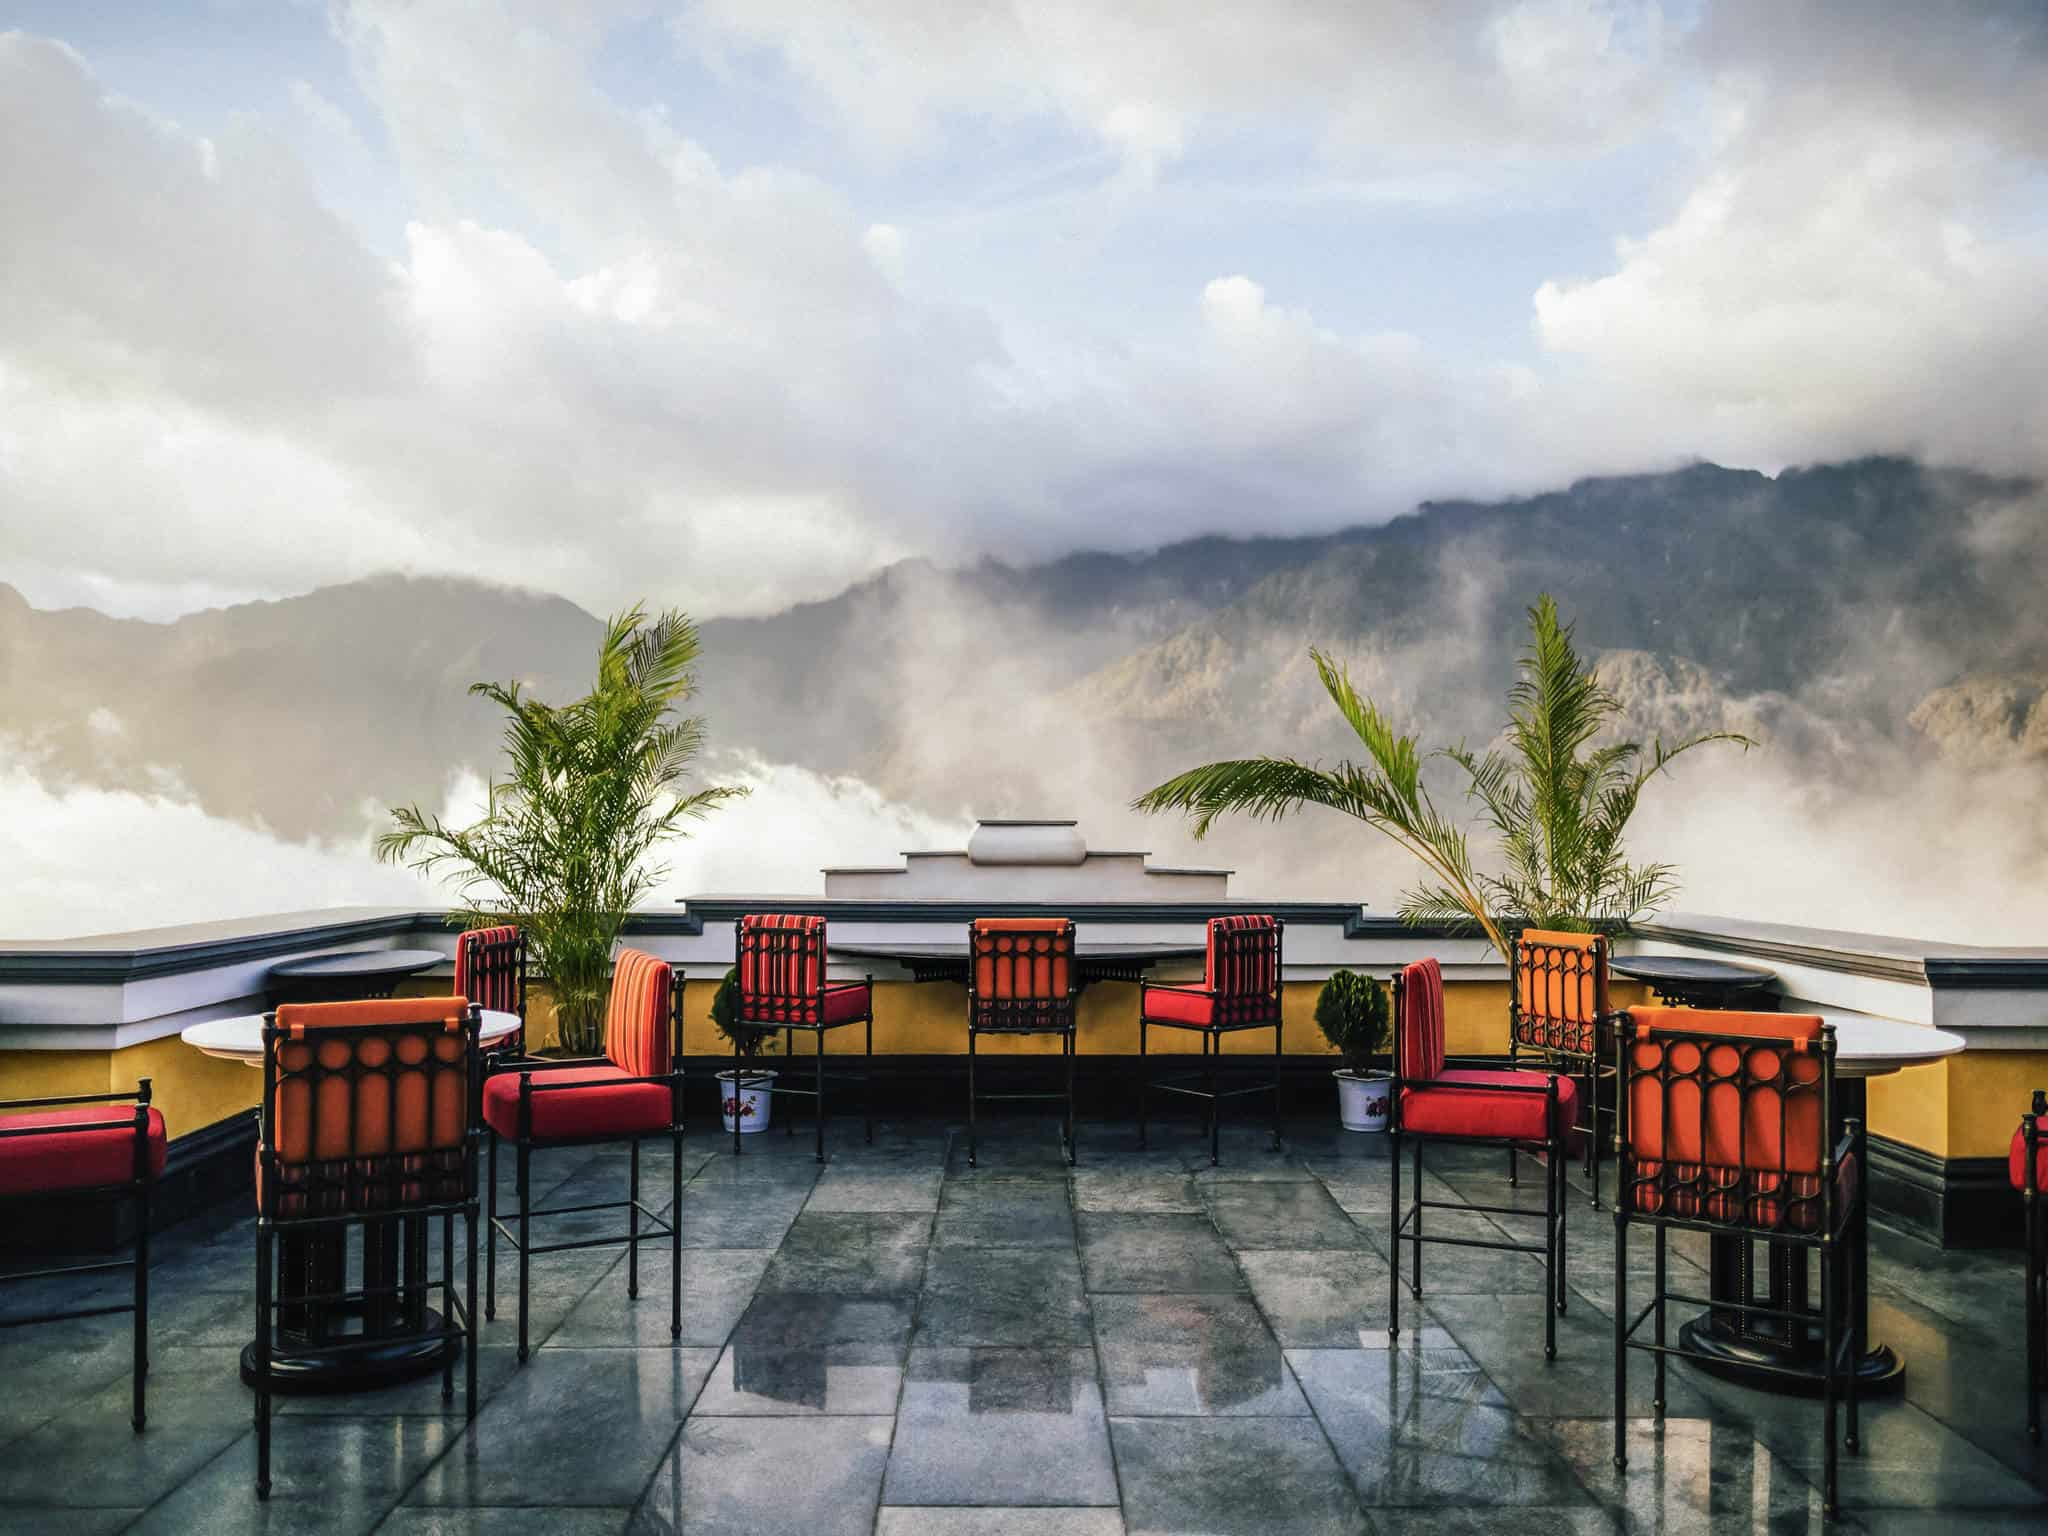 khách sạn Hotel De La Coupole Sapa – Mgallery by Sofitel